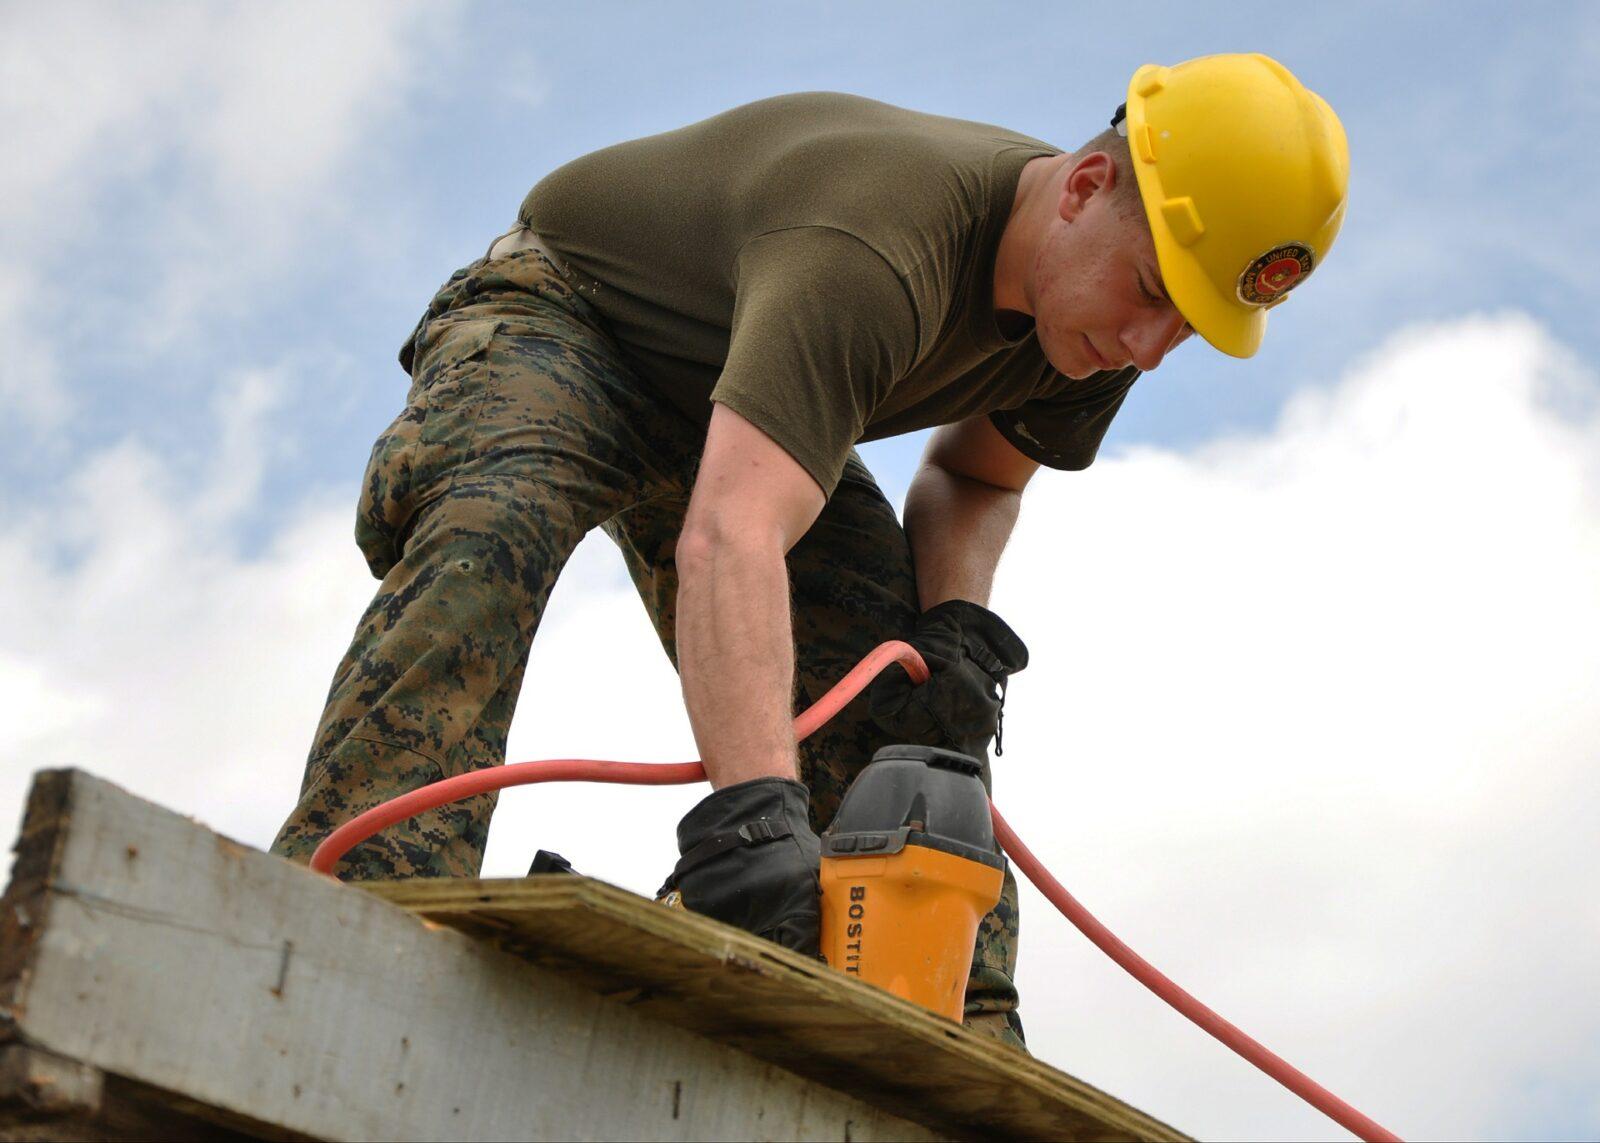 General Construction Labourer working on jobsite